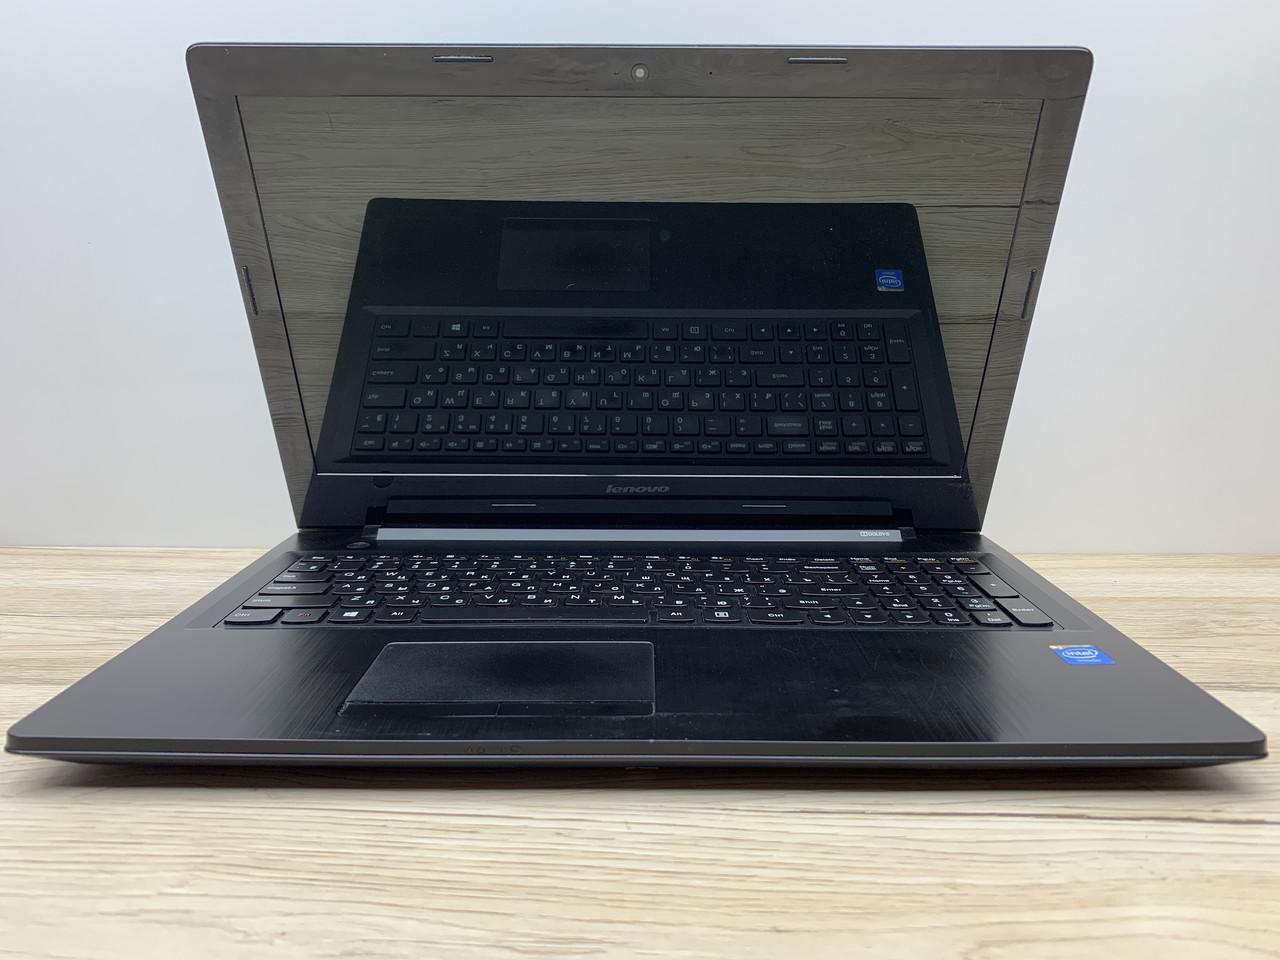 Ноутбук Б/У Lenovo G50-30 15.6 HD/ Celeron N2840 2x 2.58GHz/ RAM 4Gb/ SSD 120Gb/ АКБ 23Wh/ Сост. 8.5